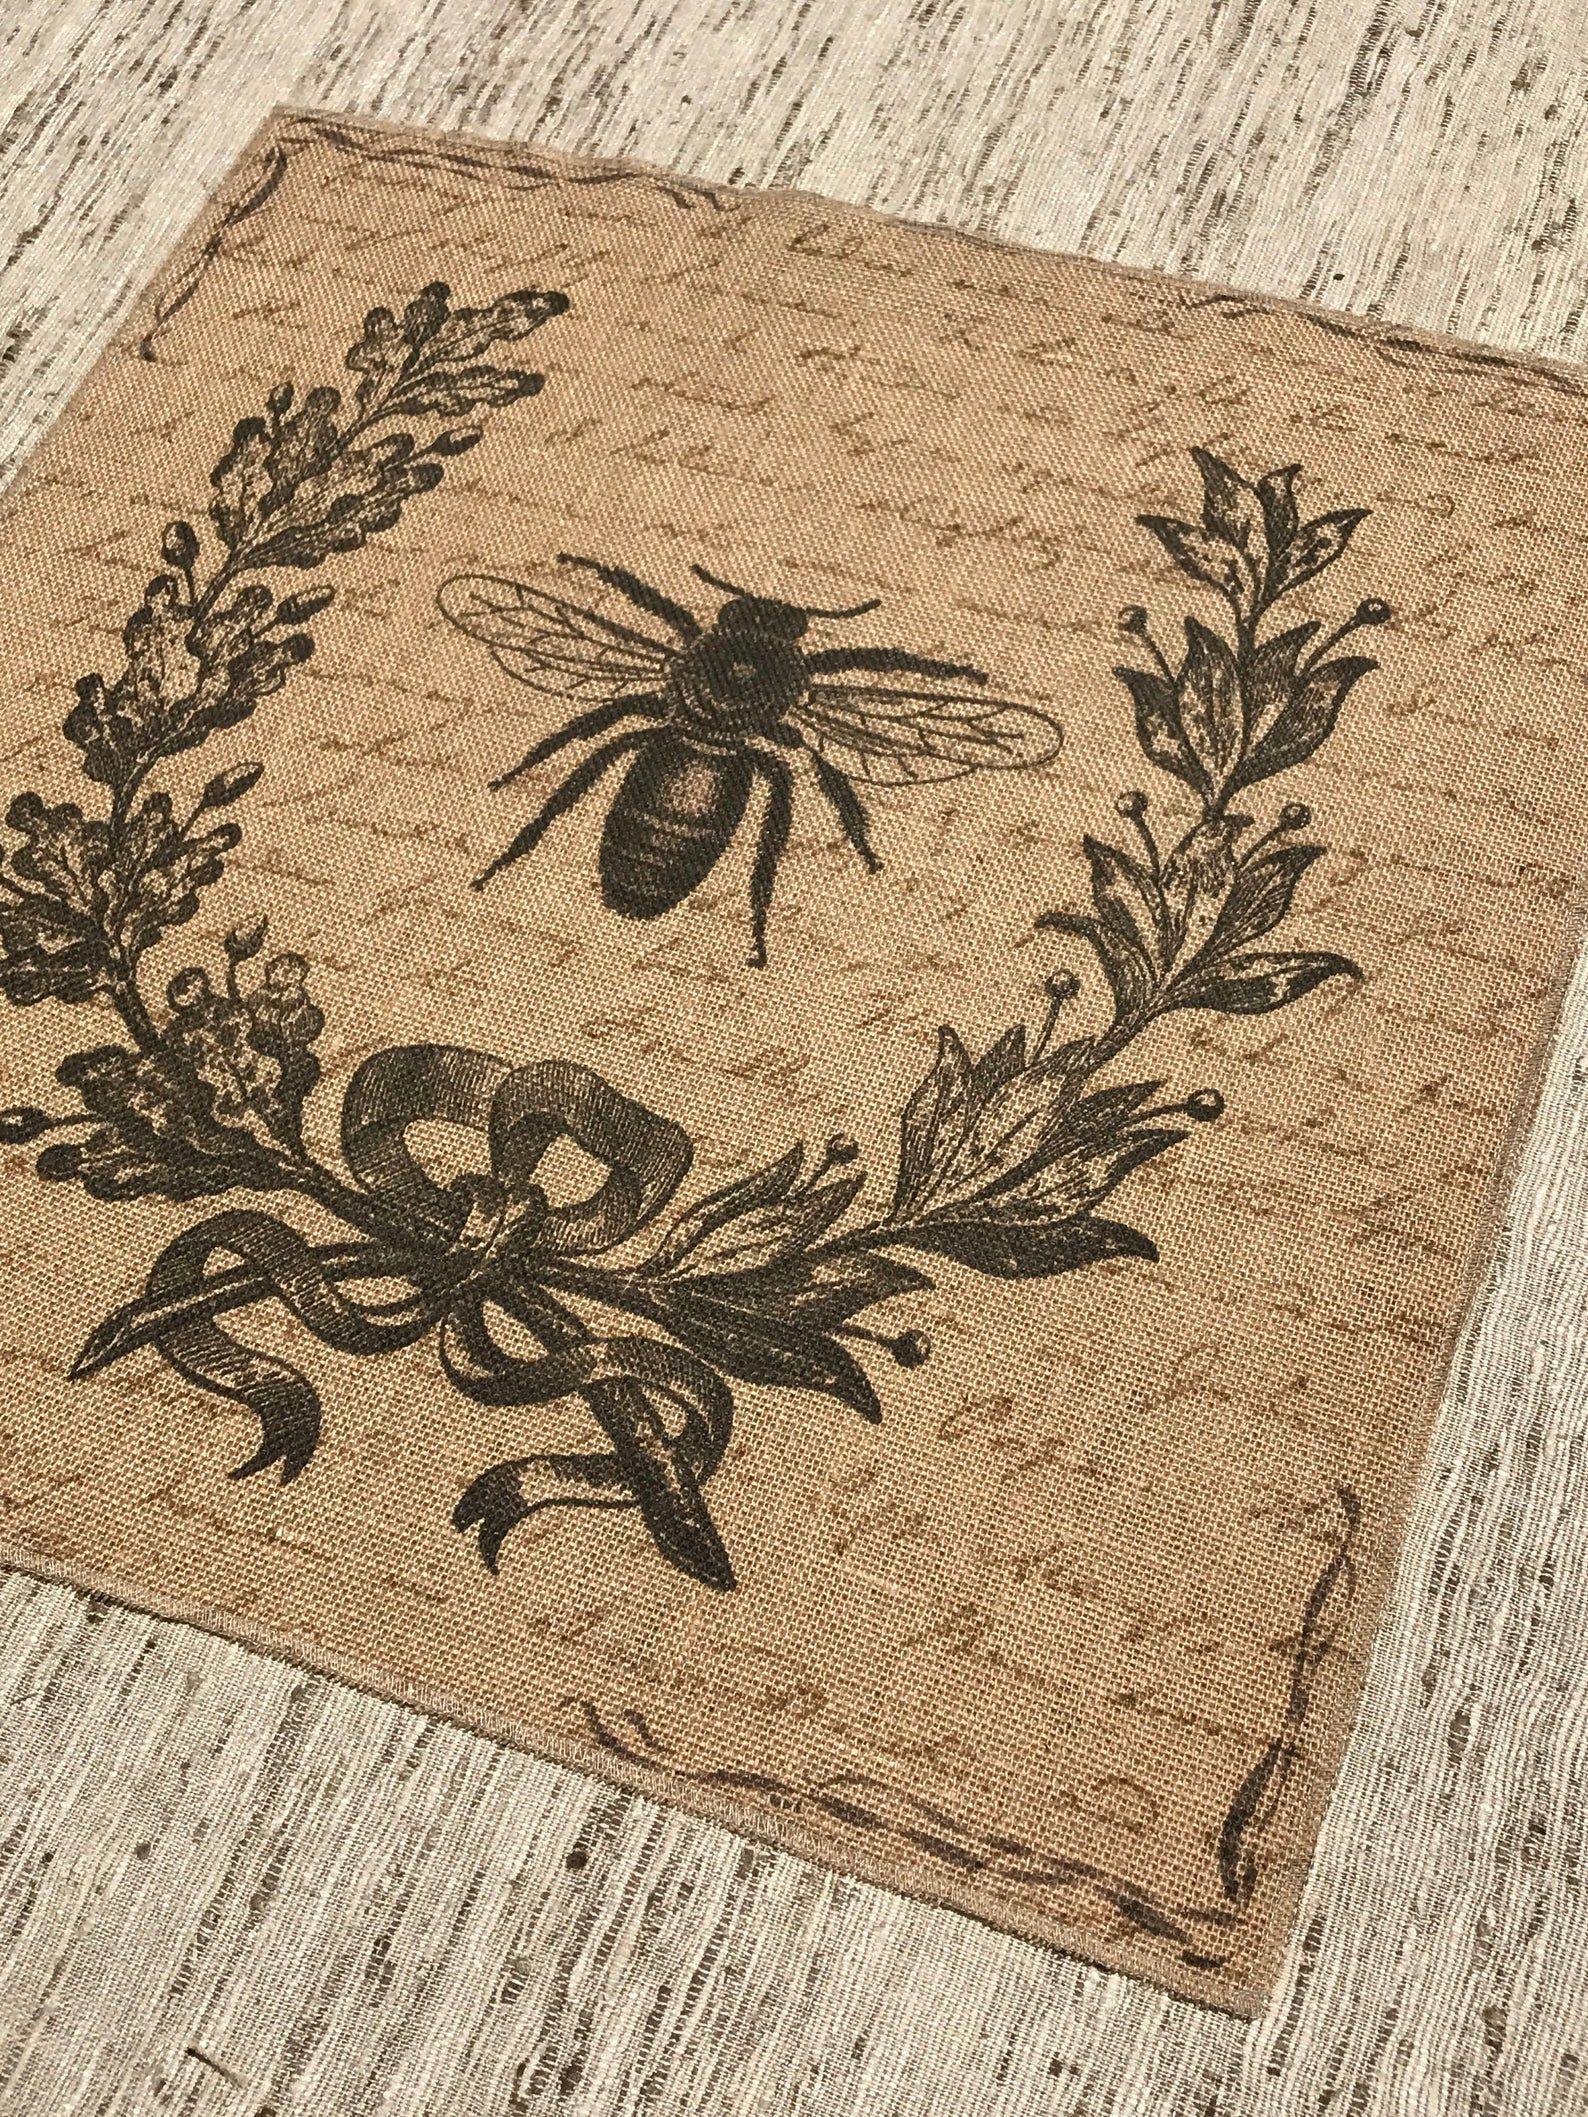 French Grain Sack Burlap Panel Reproduction Printed Fabric